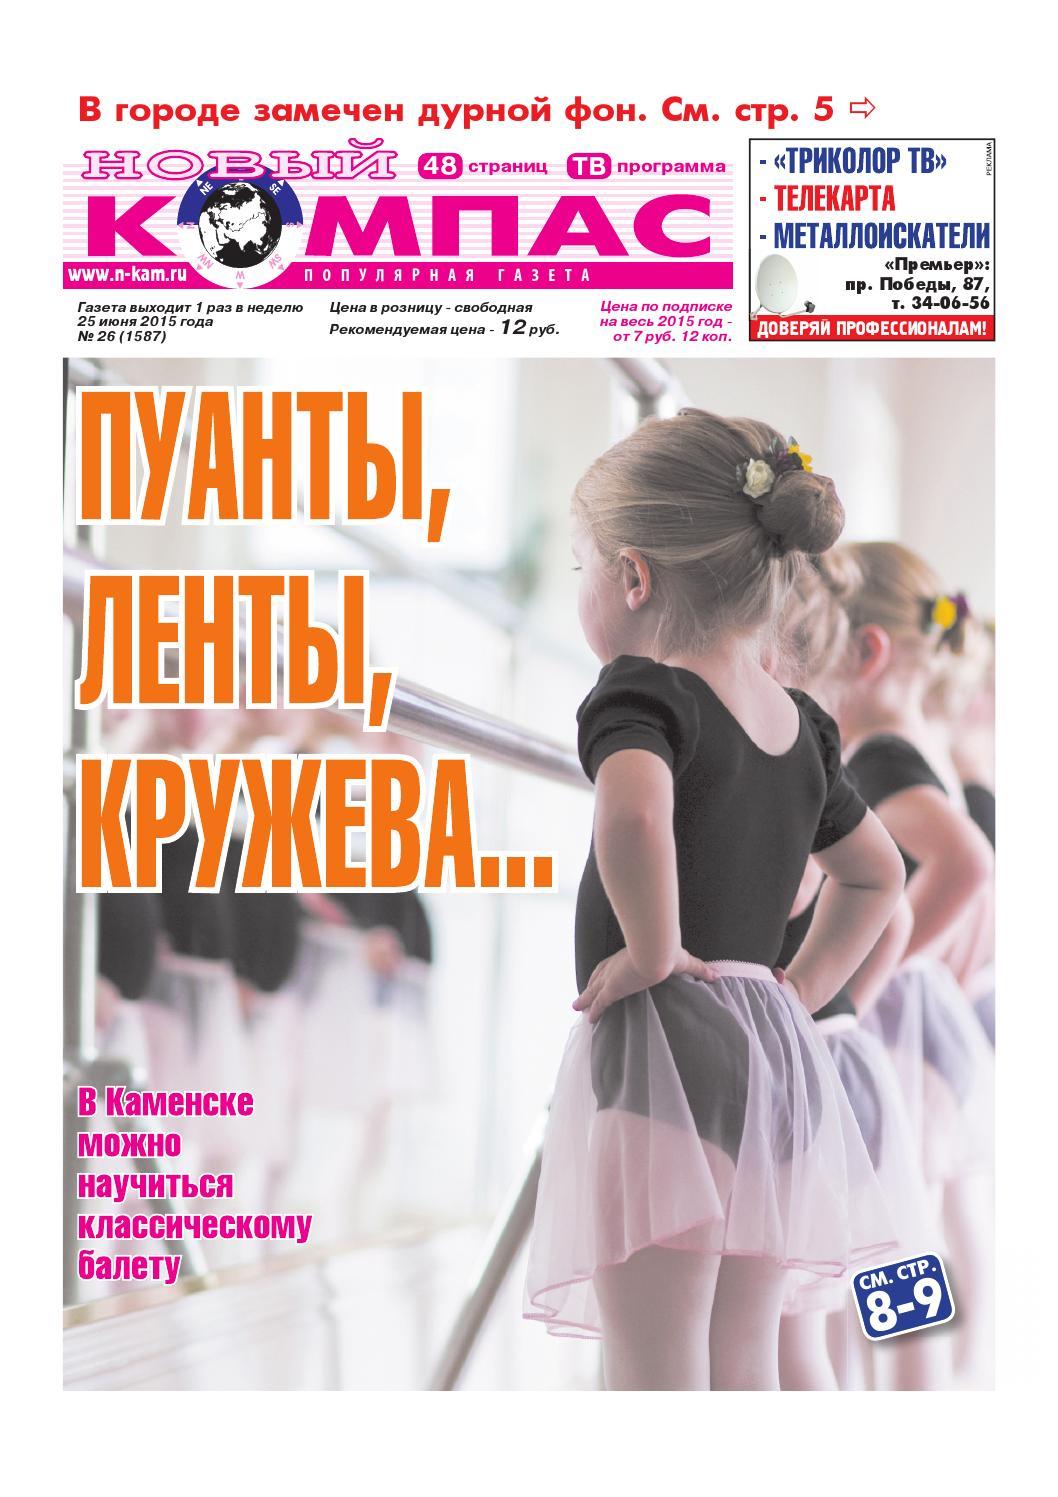 Решебник русский язык м.л.каленчук н.а чуракова т.а.байнова 3 класс